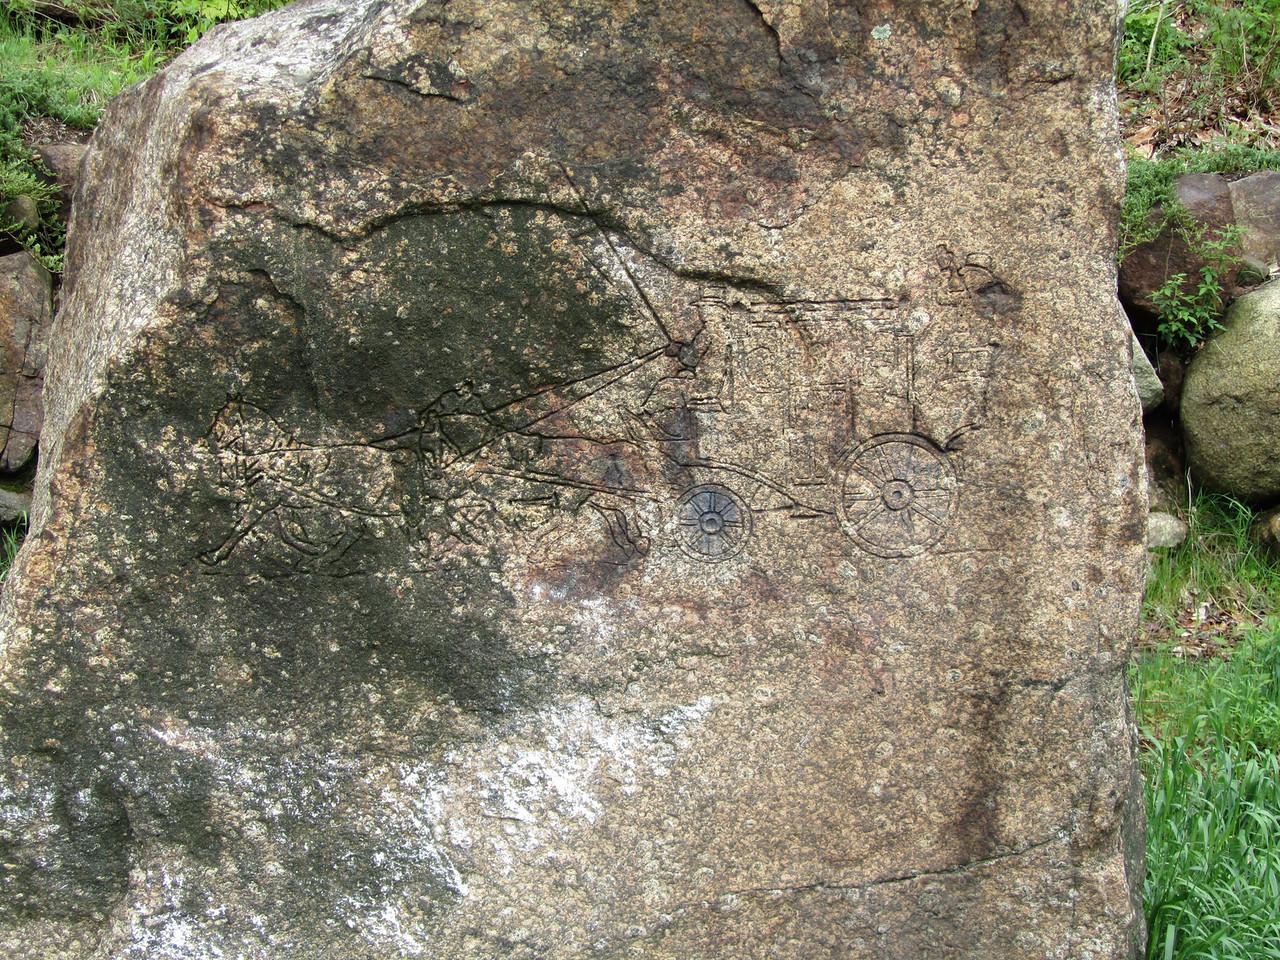 StageCoach Rock.